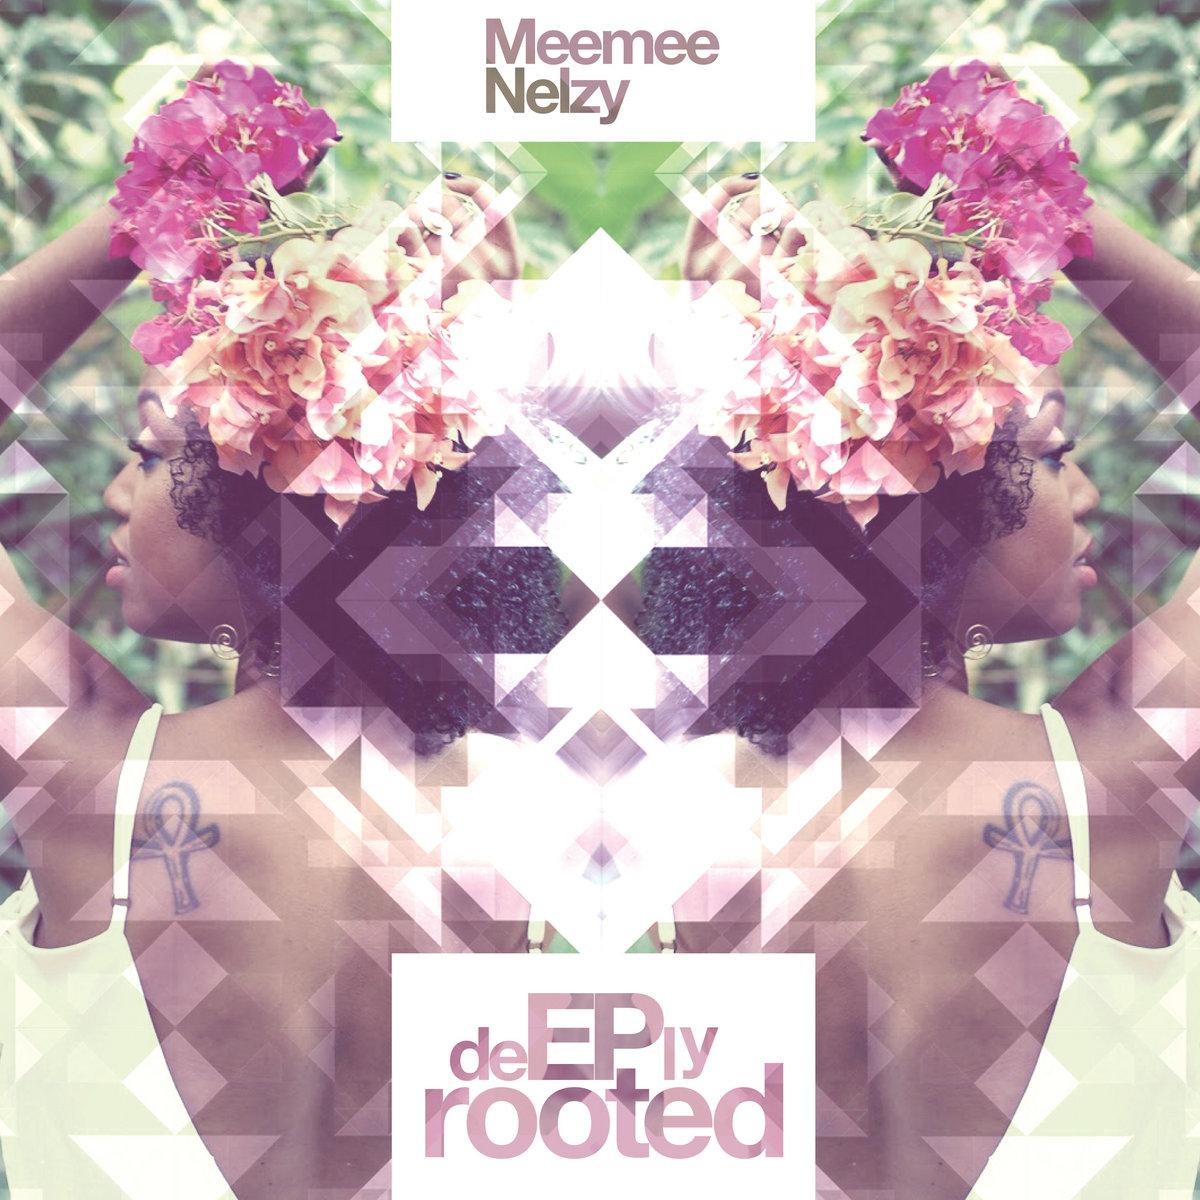 Pochette de l'album deEPly rooted de Meemee Nelzy